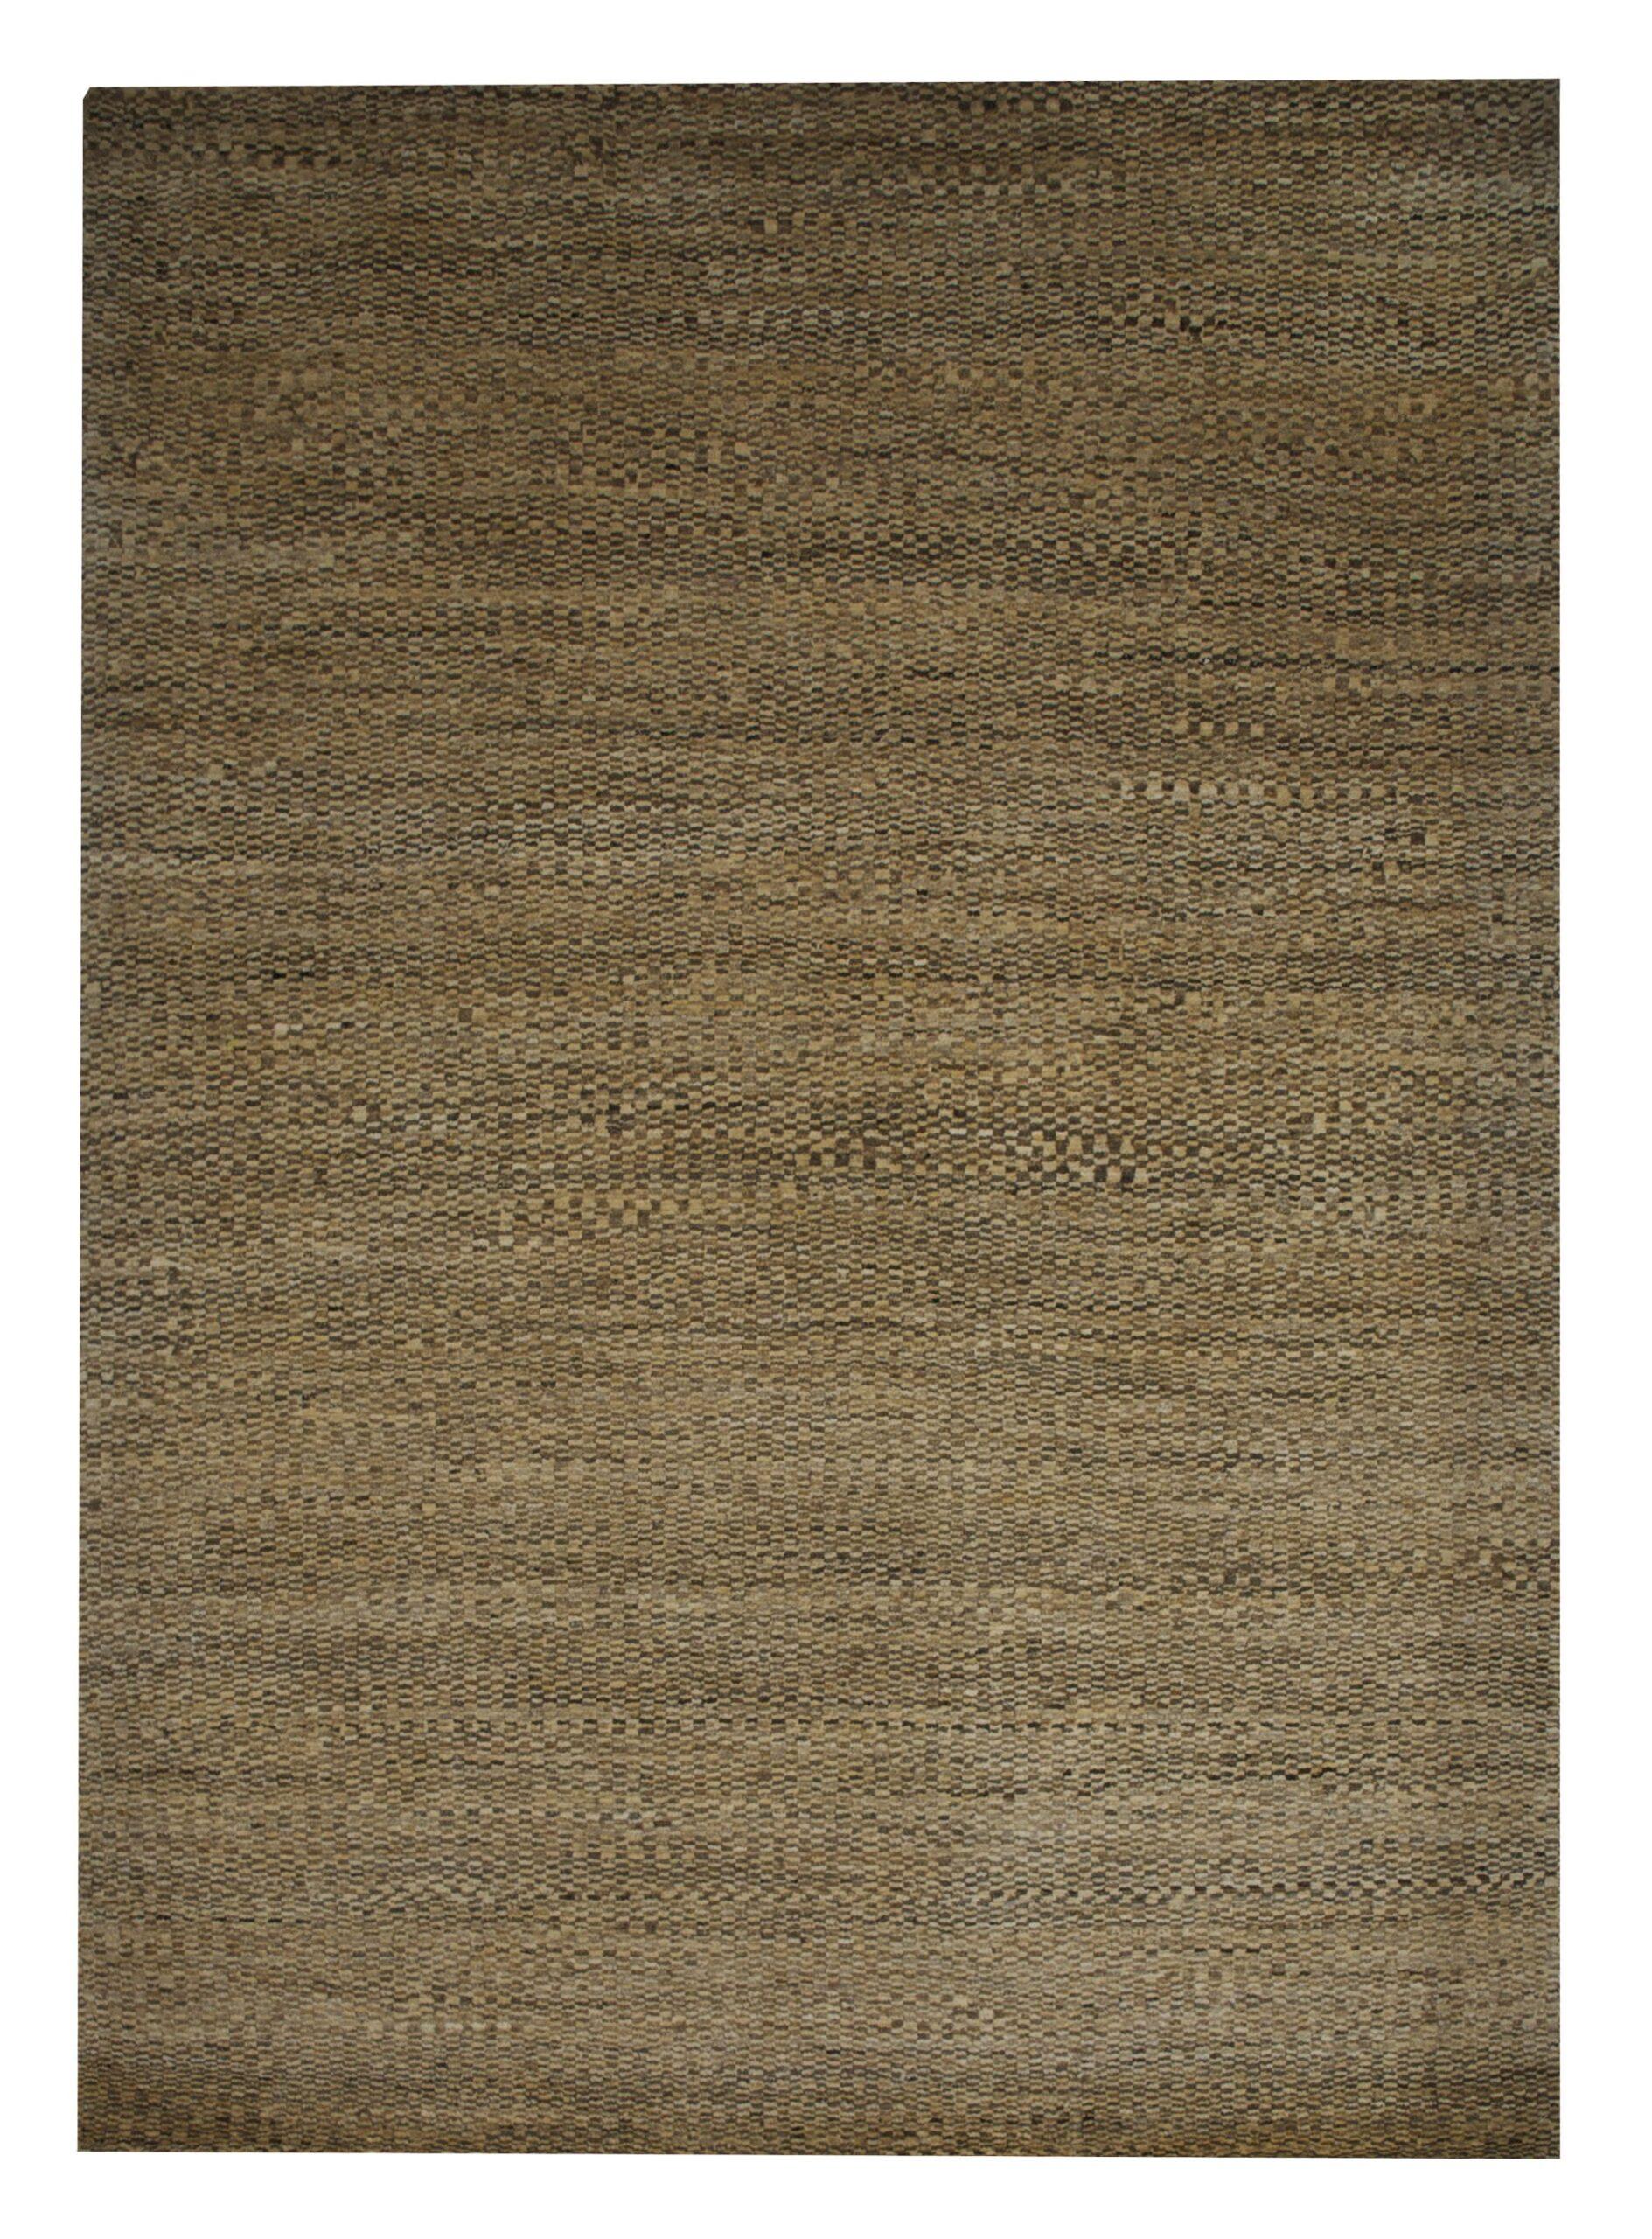 "Gabbeh 4' 10"" x 6' 9"" Wool Handmade Area Rug - Shabahang Royal Carpet"